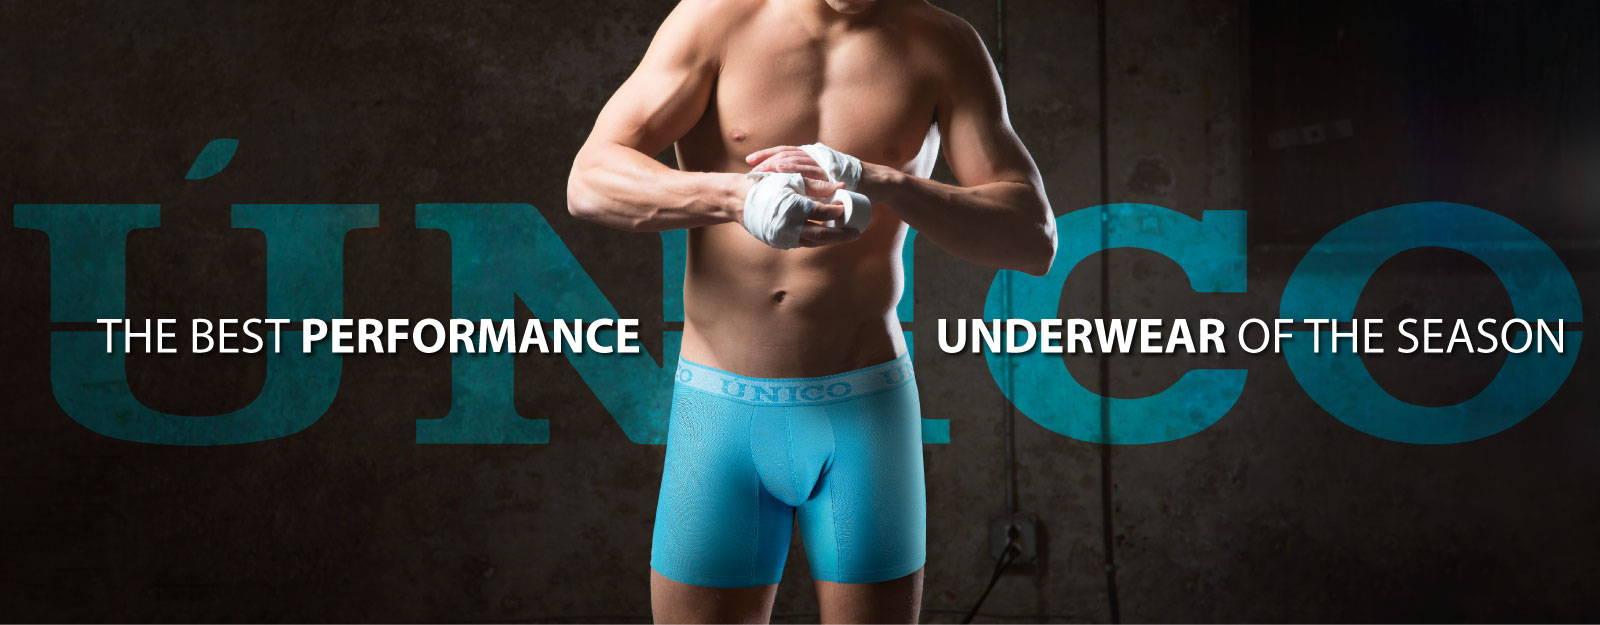 Unico The Best Performance Underwear Of The Season